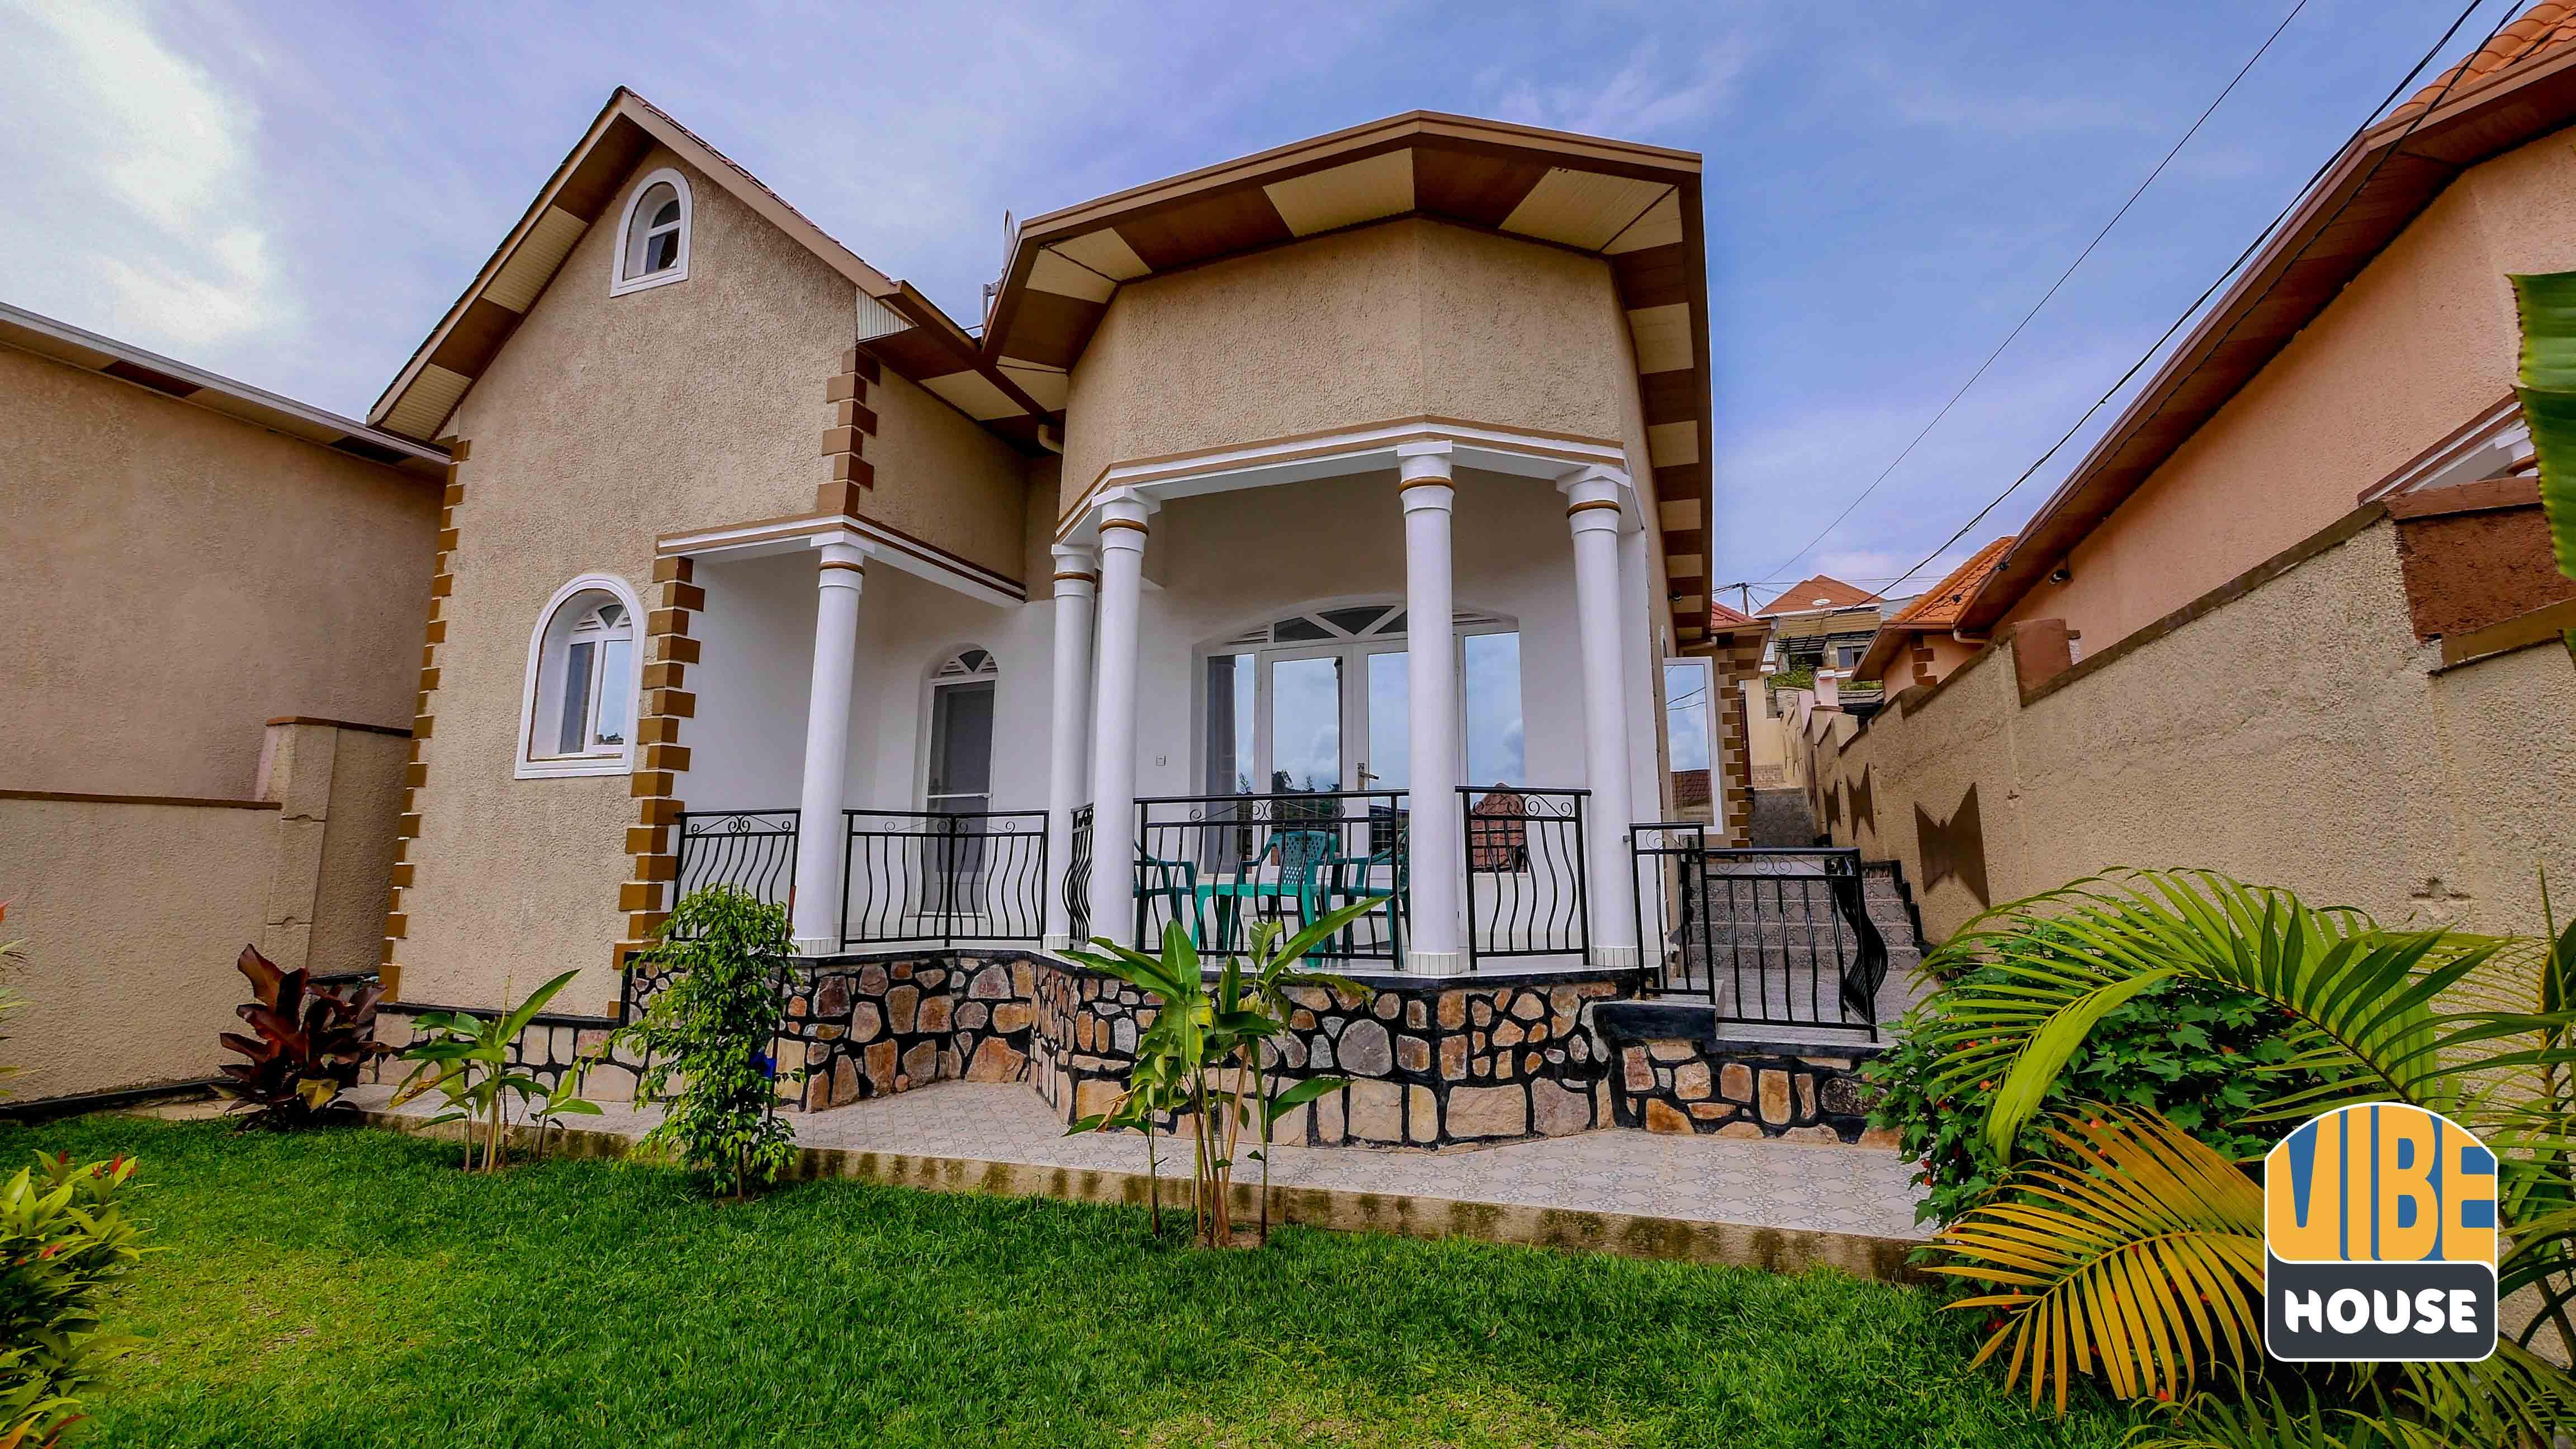 House for Rent Kigali Kibagabaga 19 04 10 1 11